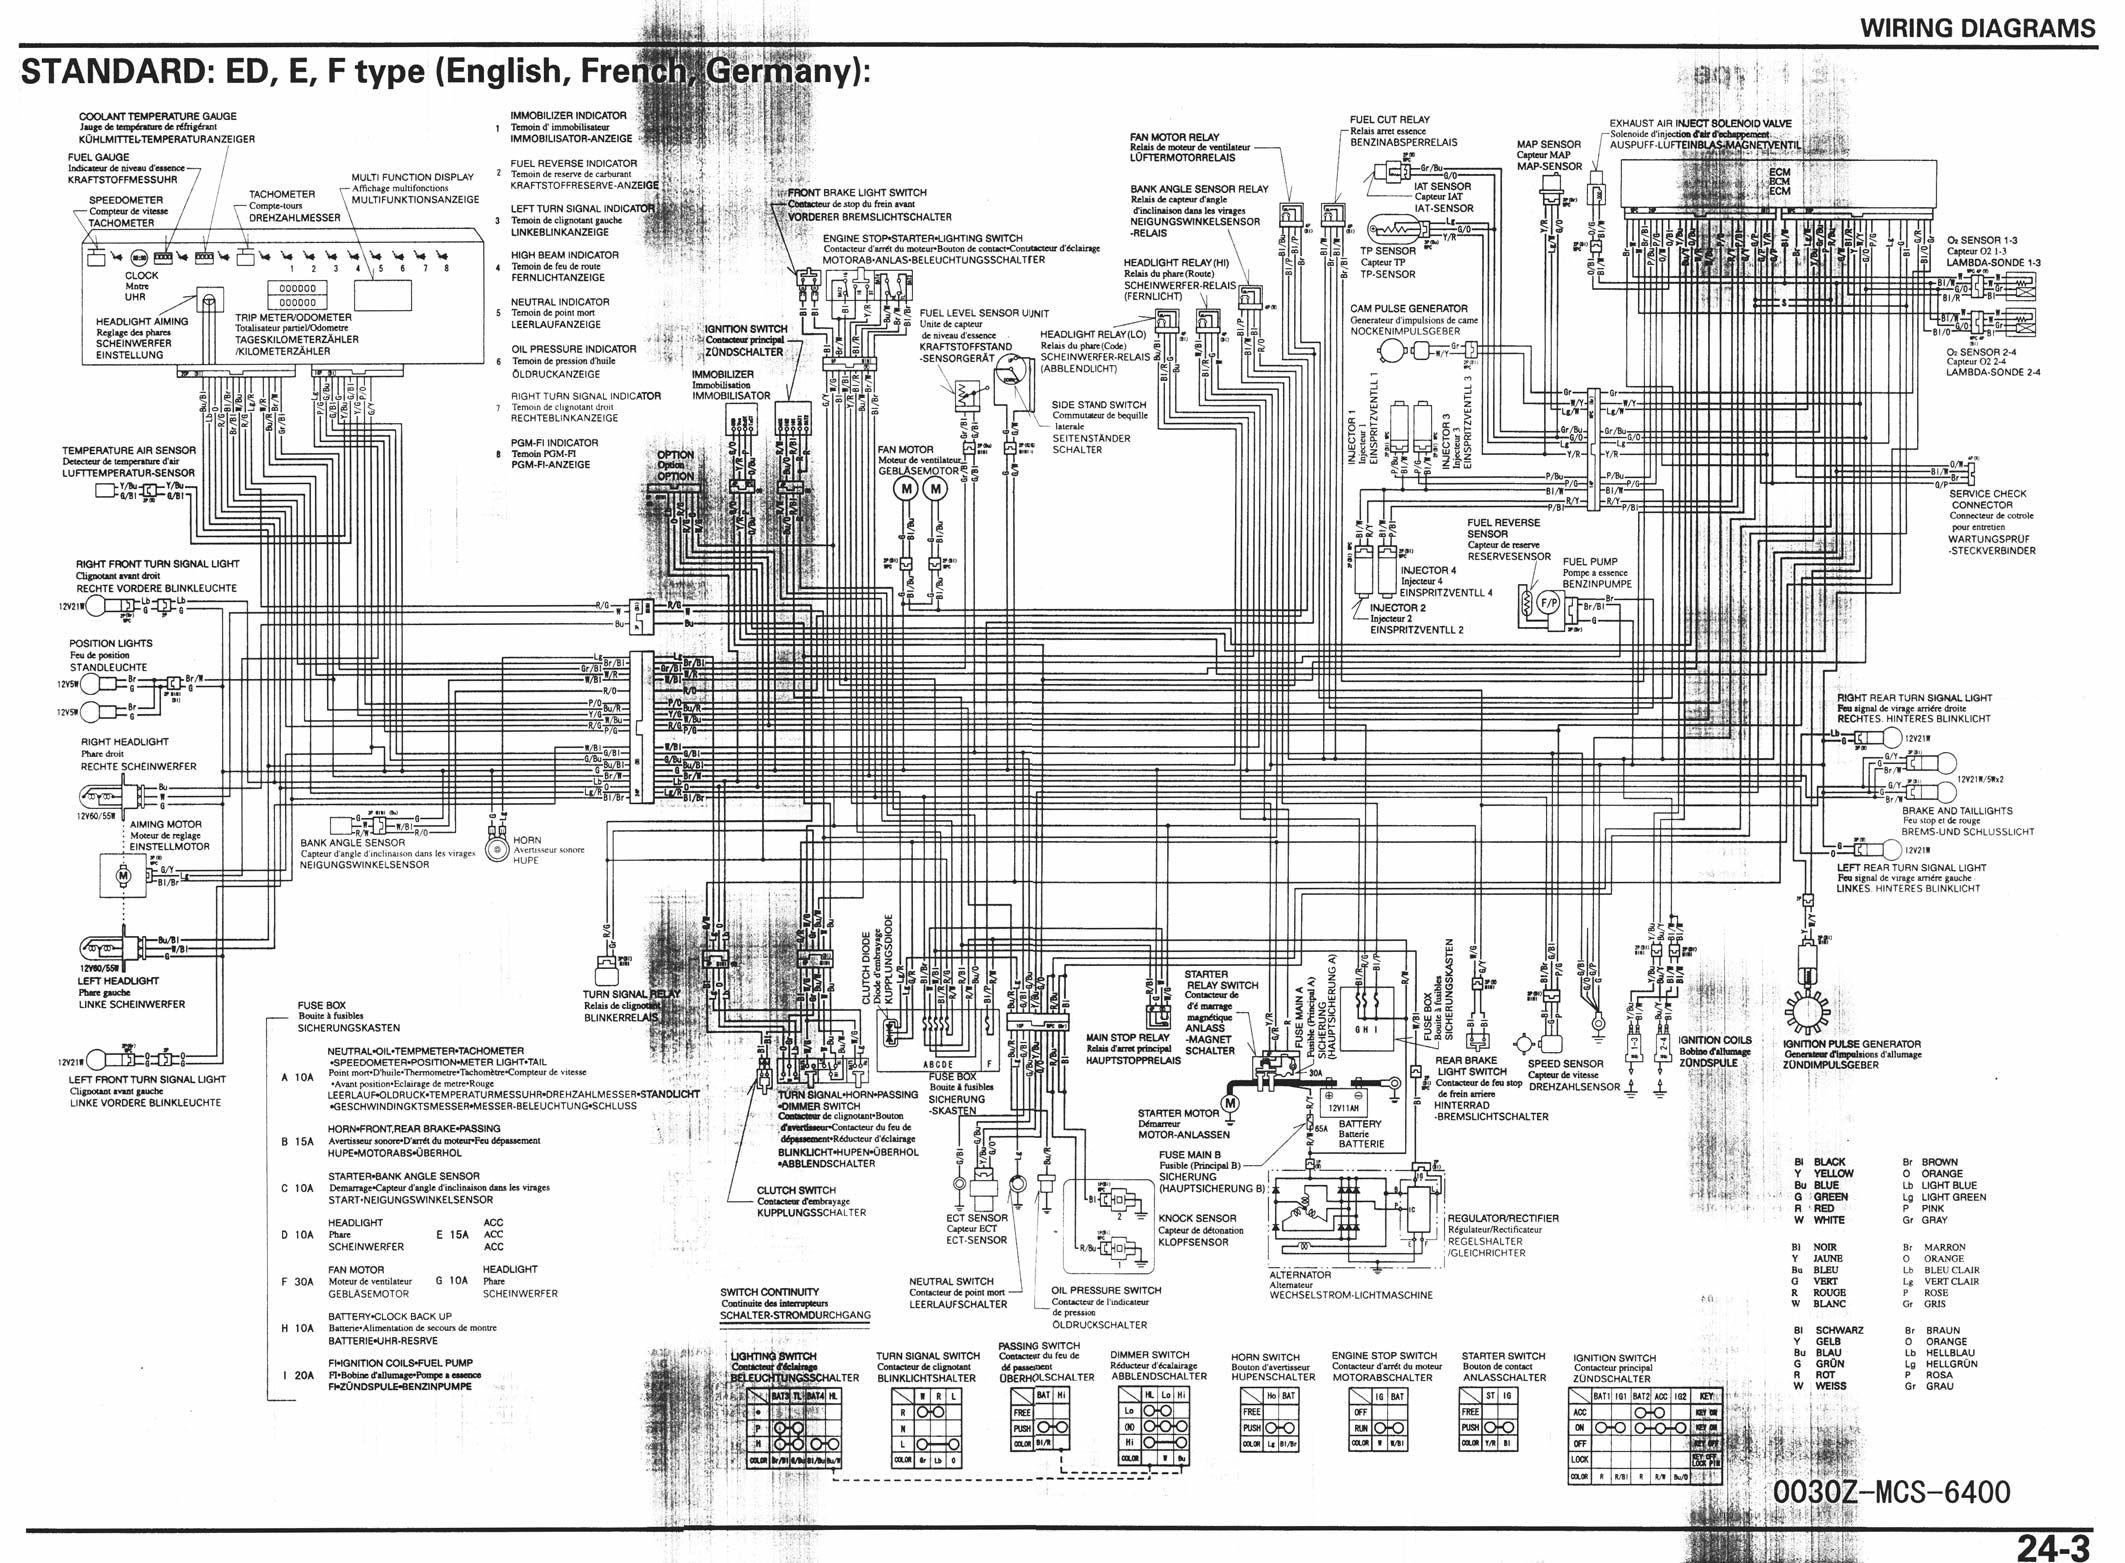 2008 bmw wiring diagram wiring diagram g8 bmw k 1200 wiring diagram wiring diagram